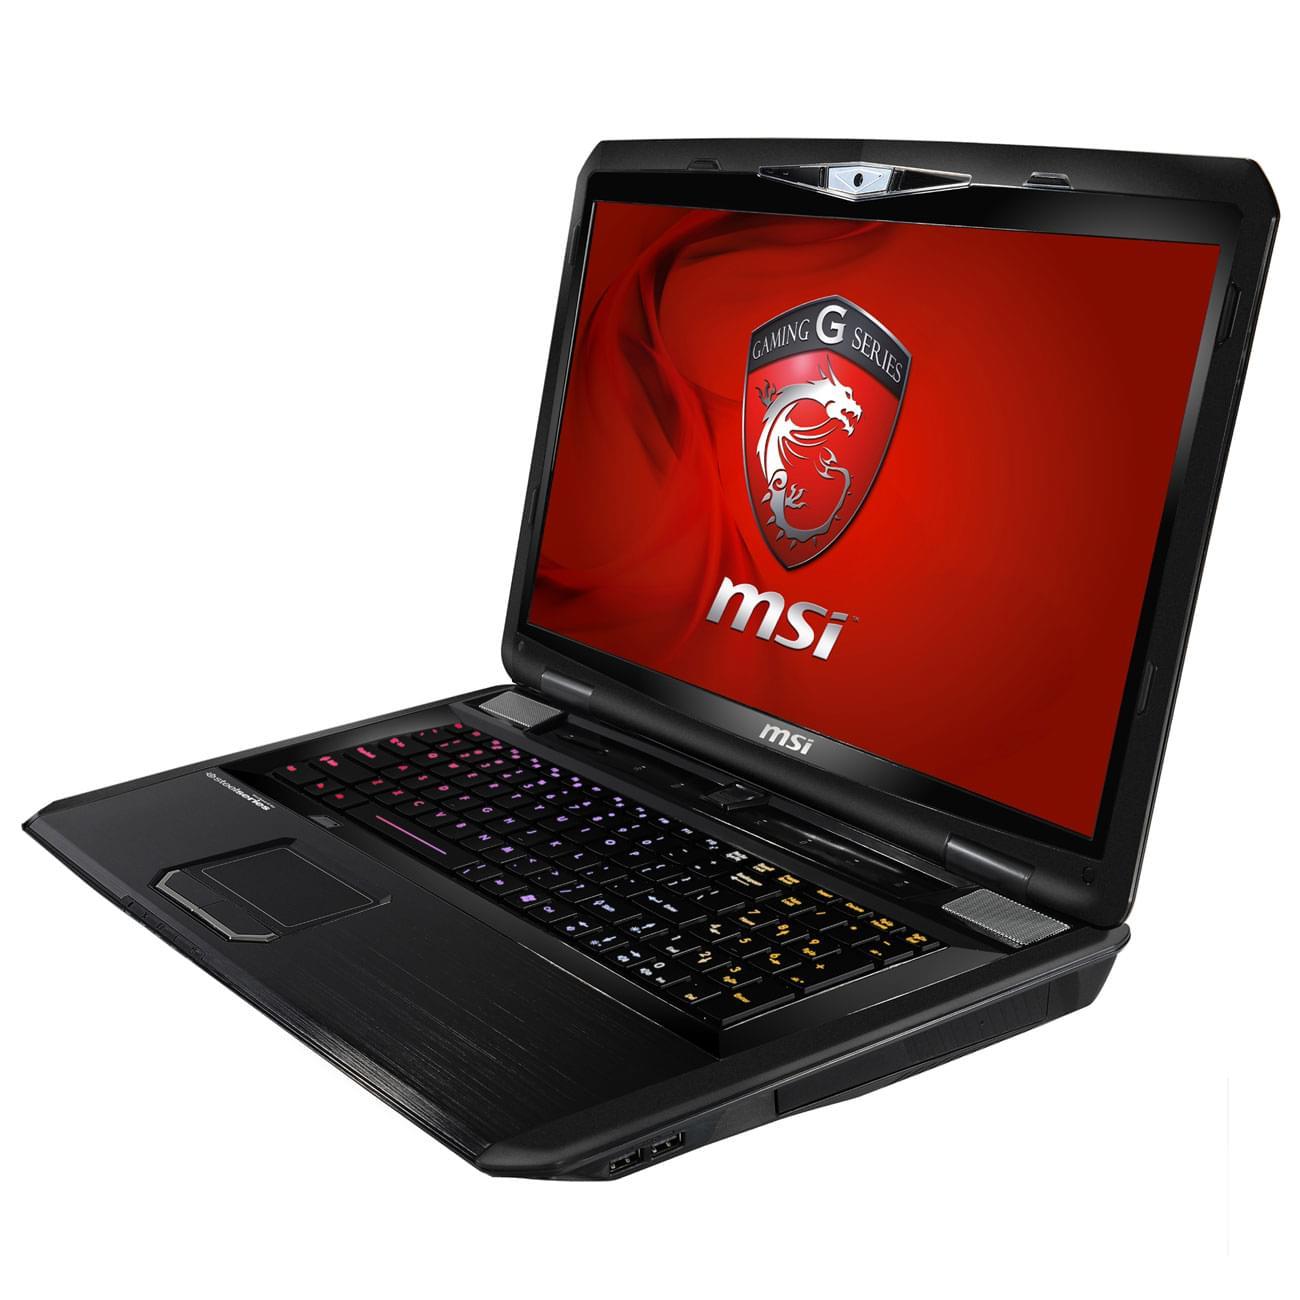 MSI GT70 2PC-1216XFR (9S7-1763A2-1216) - Achat / Vente PC portable sur Cybertek.fr - 0